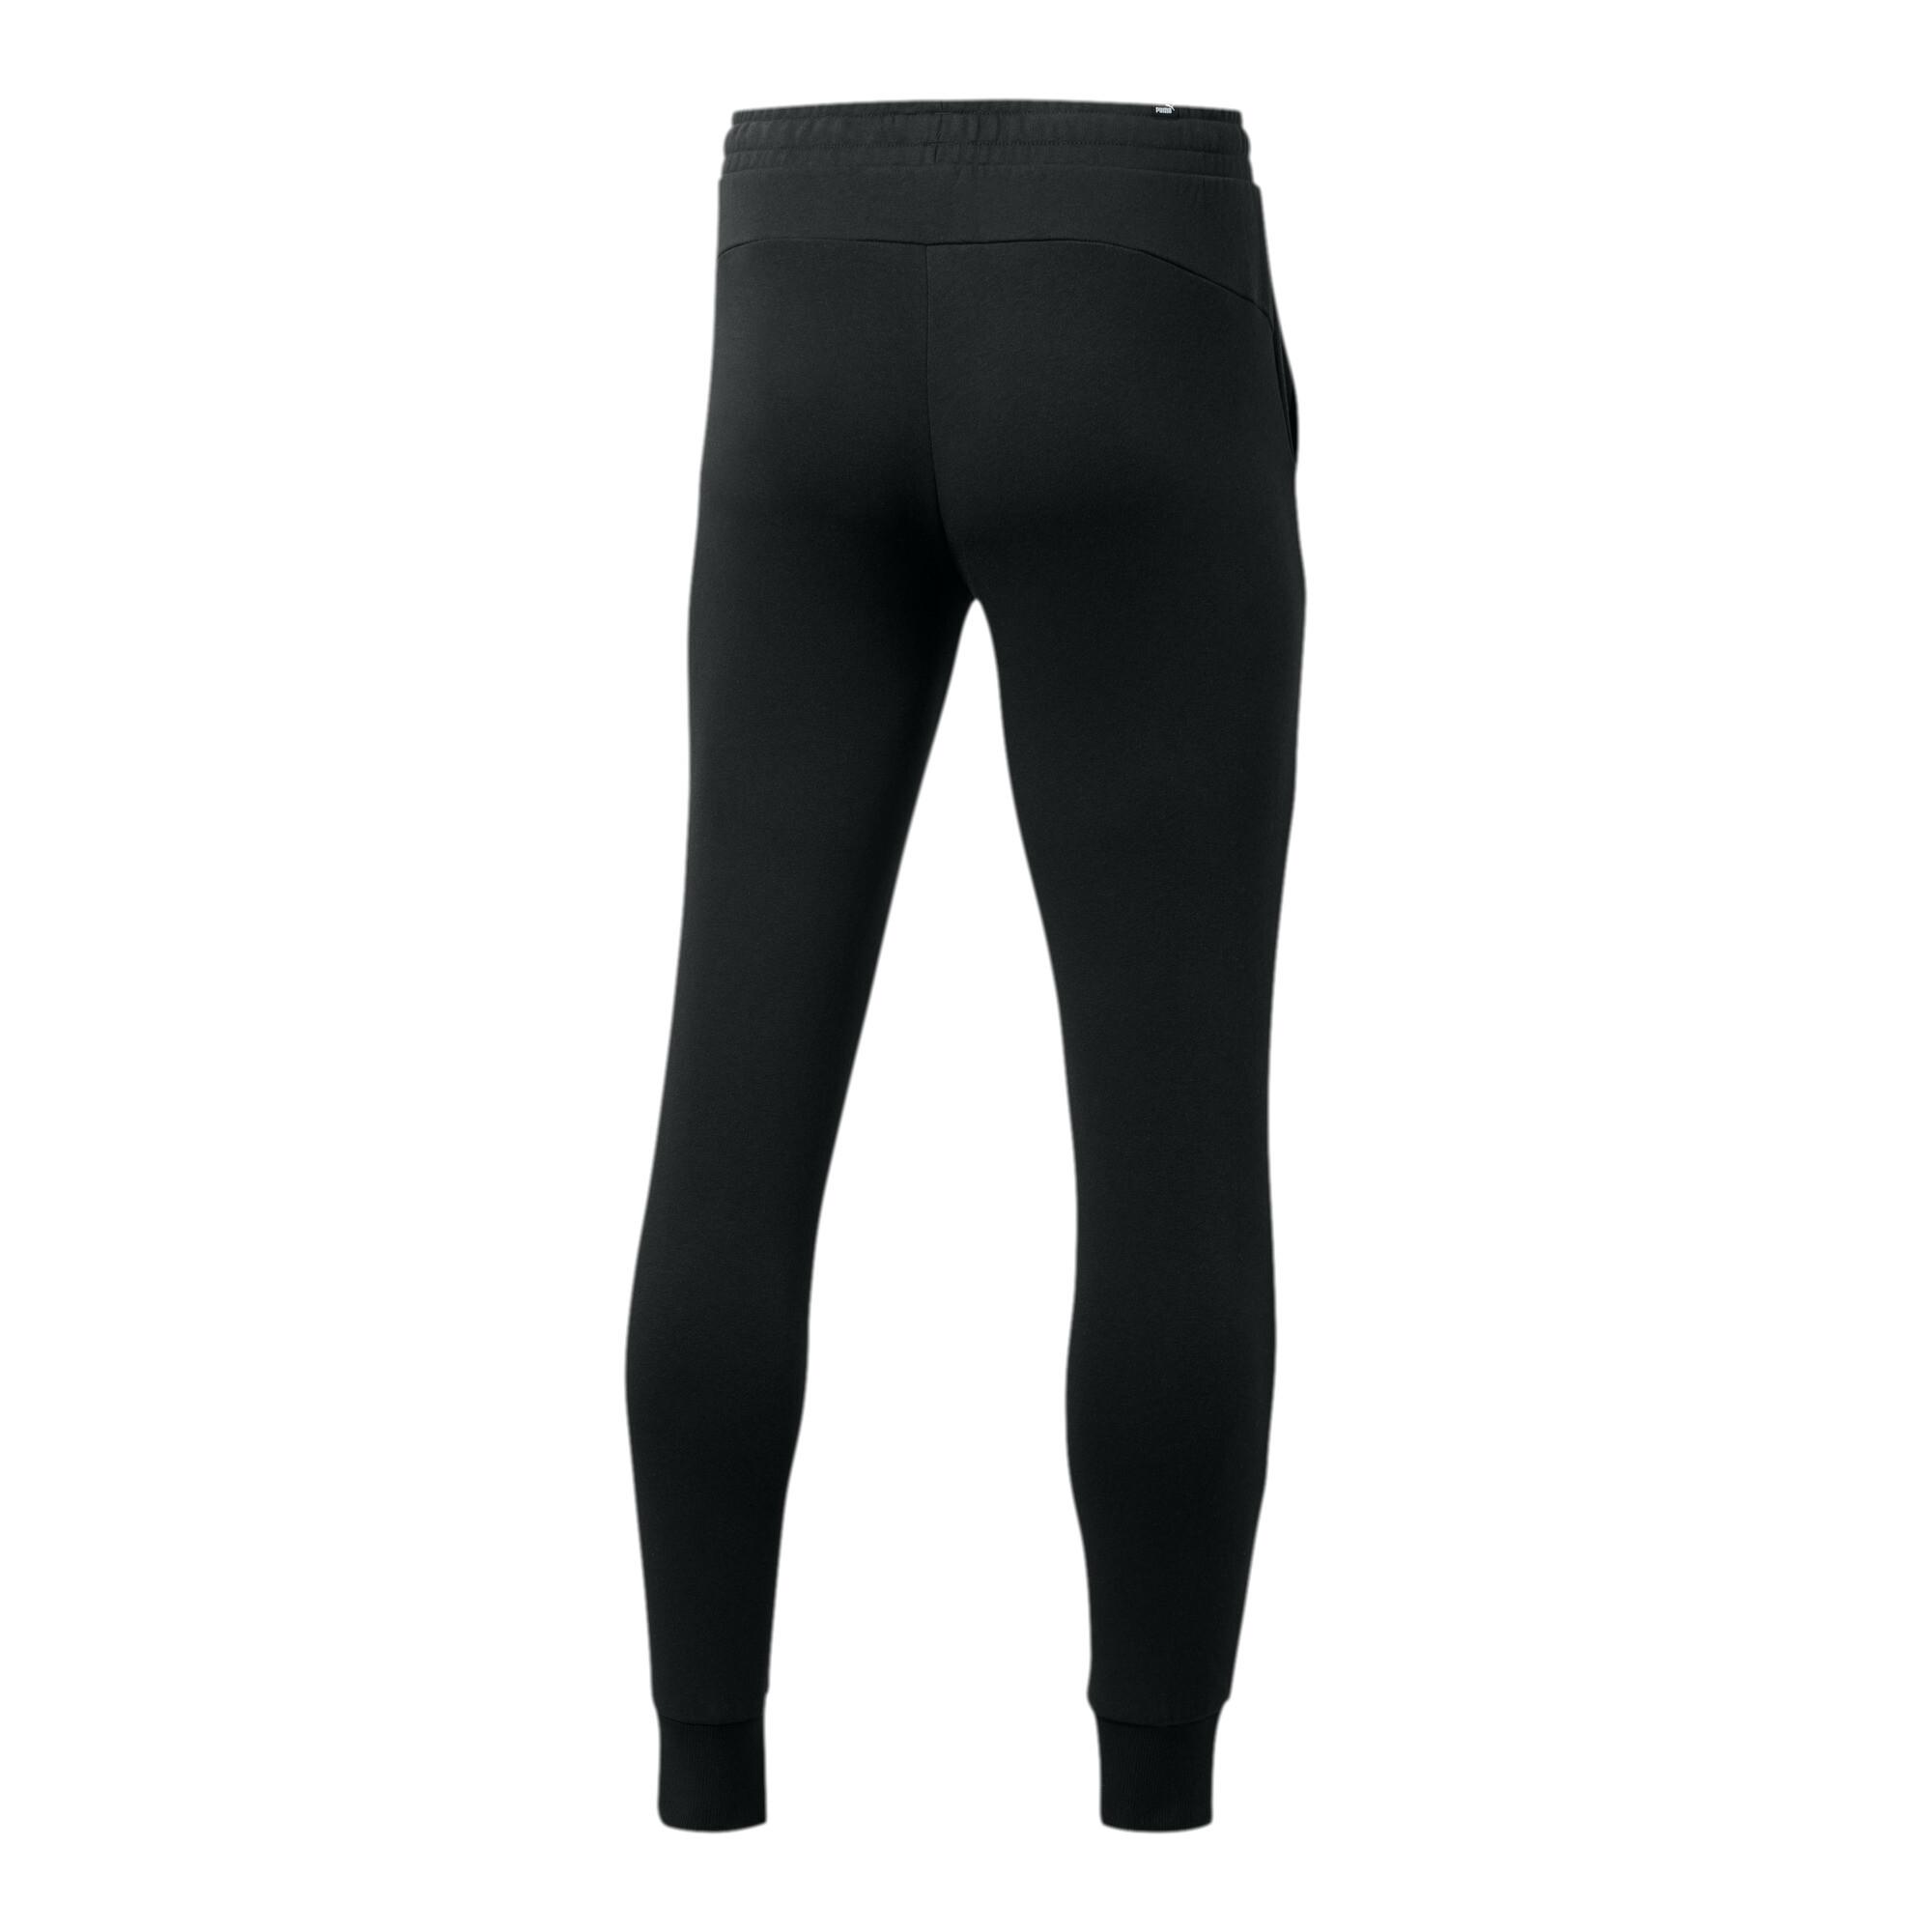 PUMA-Essentials-Men-039-s-Sweatpants-Men-Knitted-Pants-Basics thumbnail 5